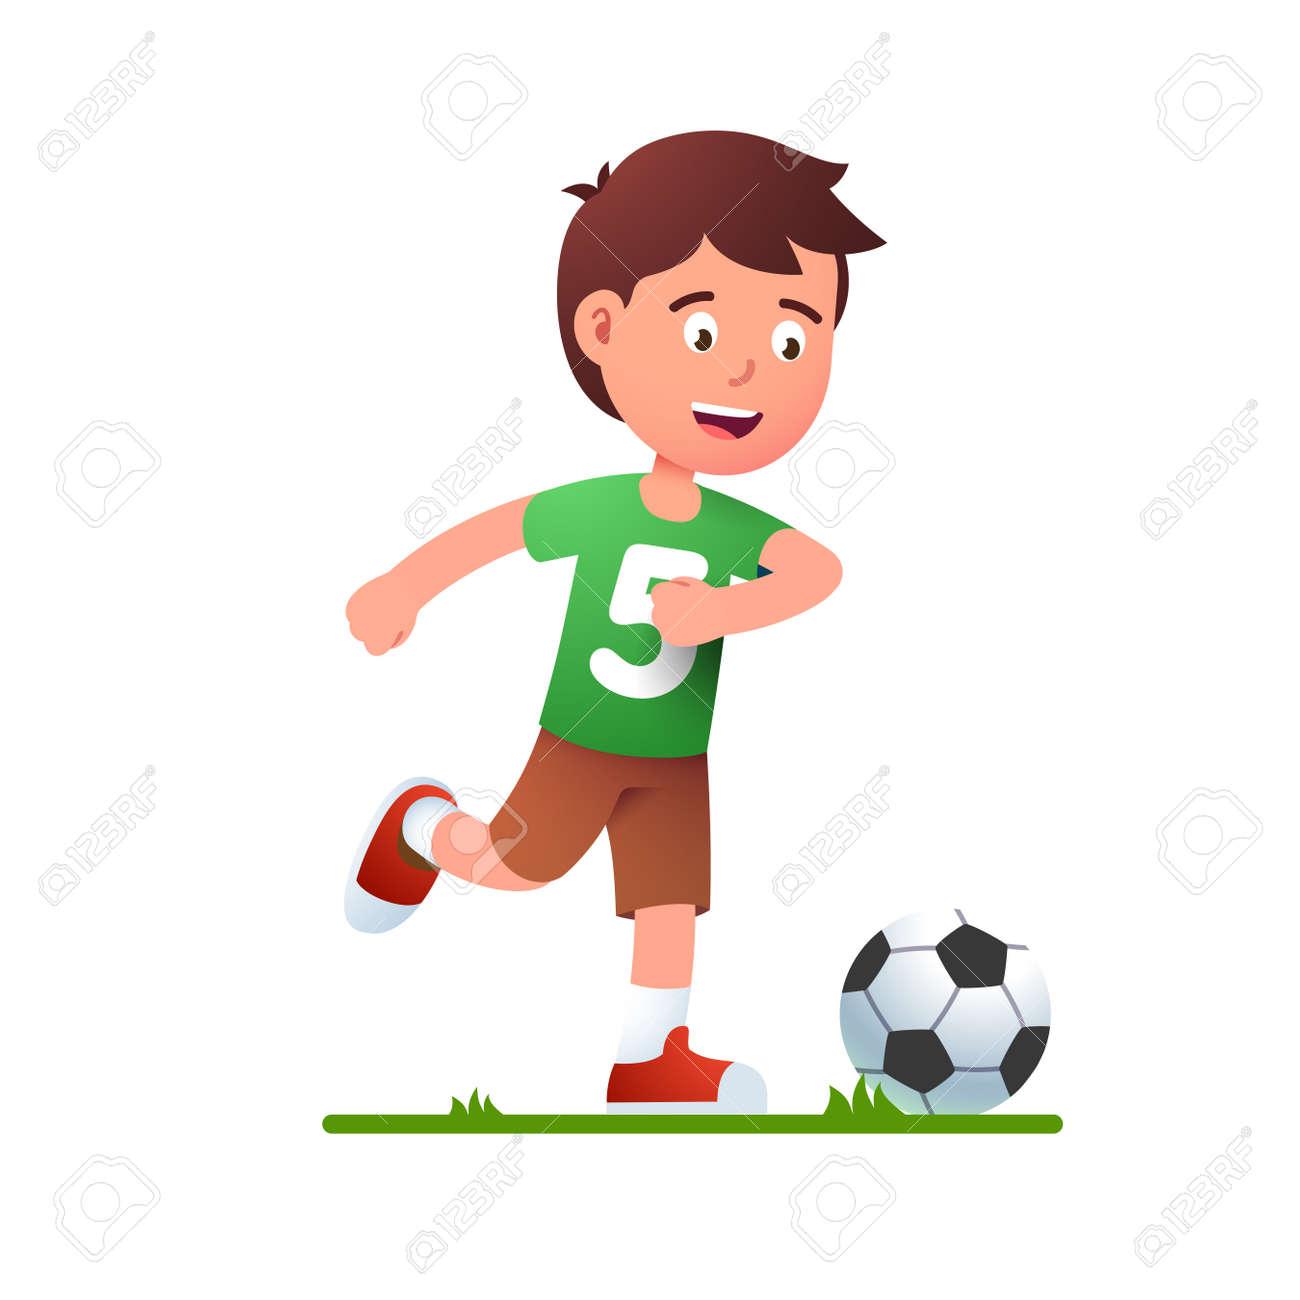 Boy playing soccer game. Kid in football uniform - 153086098